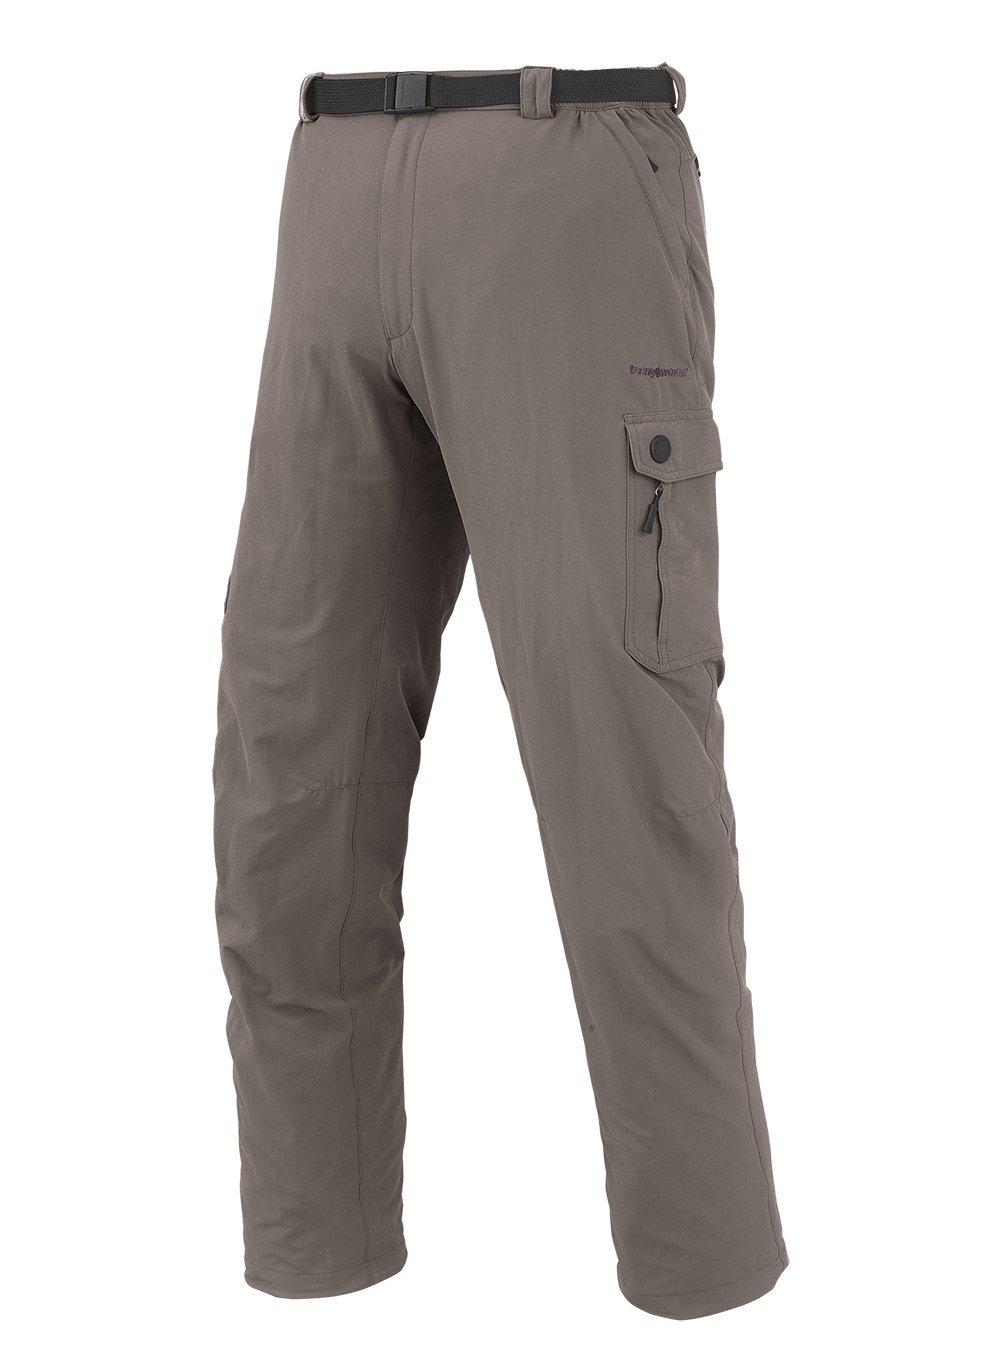 Marron (marron bungee) S Trangoworld Murren Pantalon Long, Homme